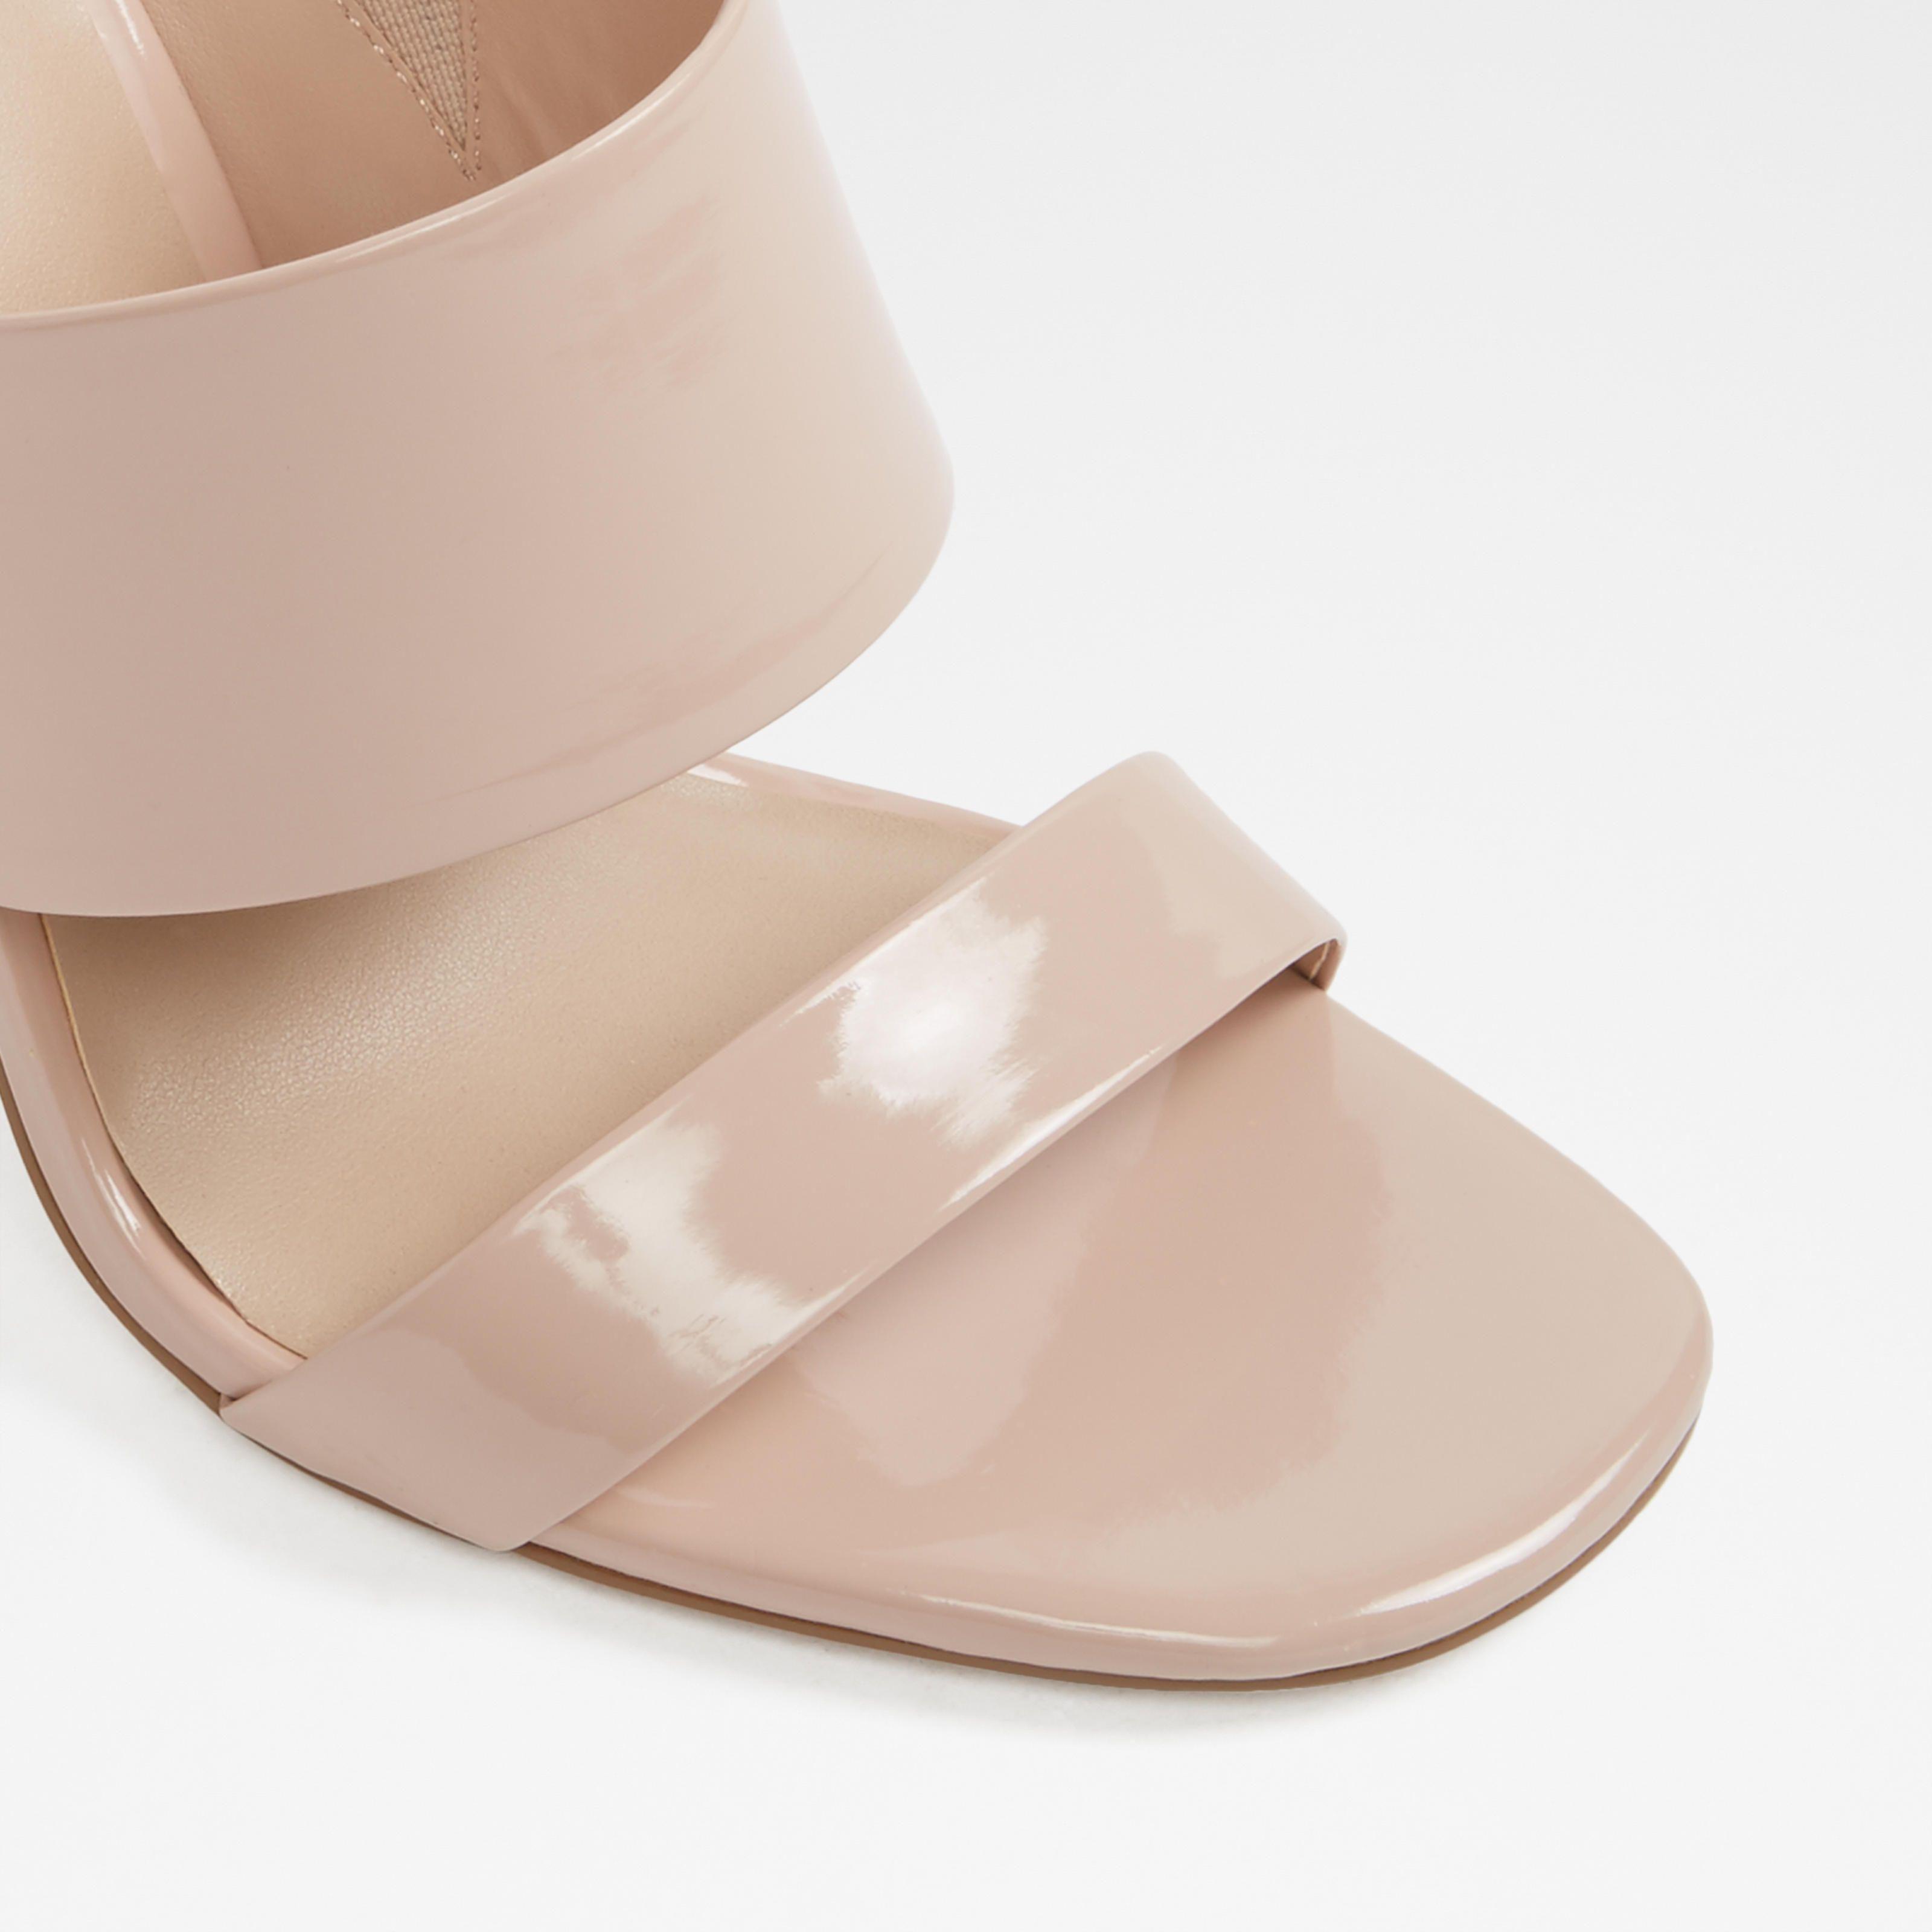 Froema Bone Women's Heeled sandals